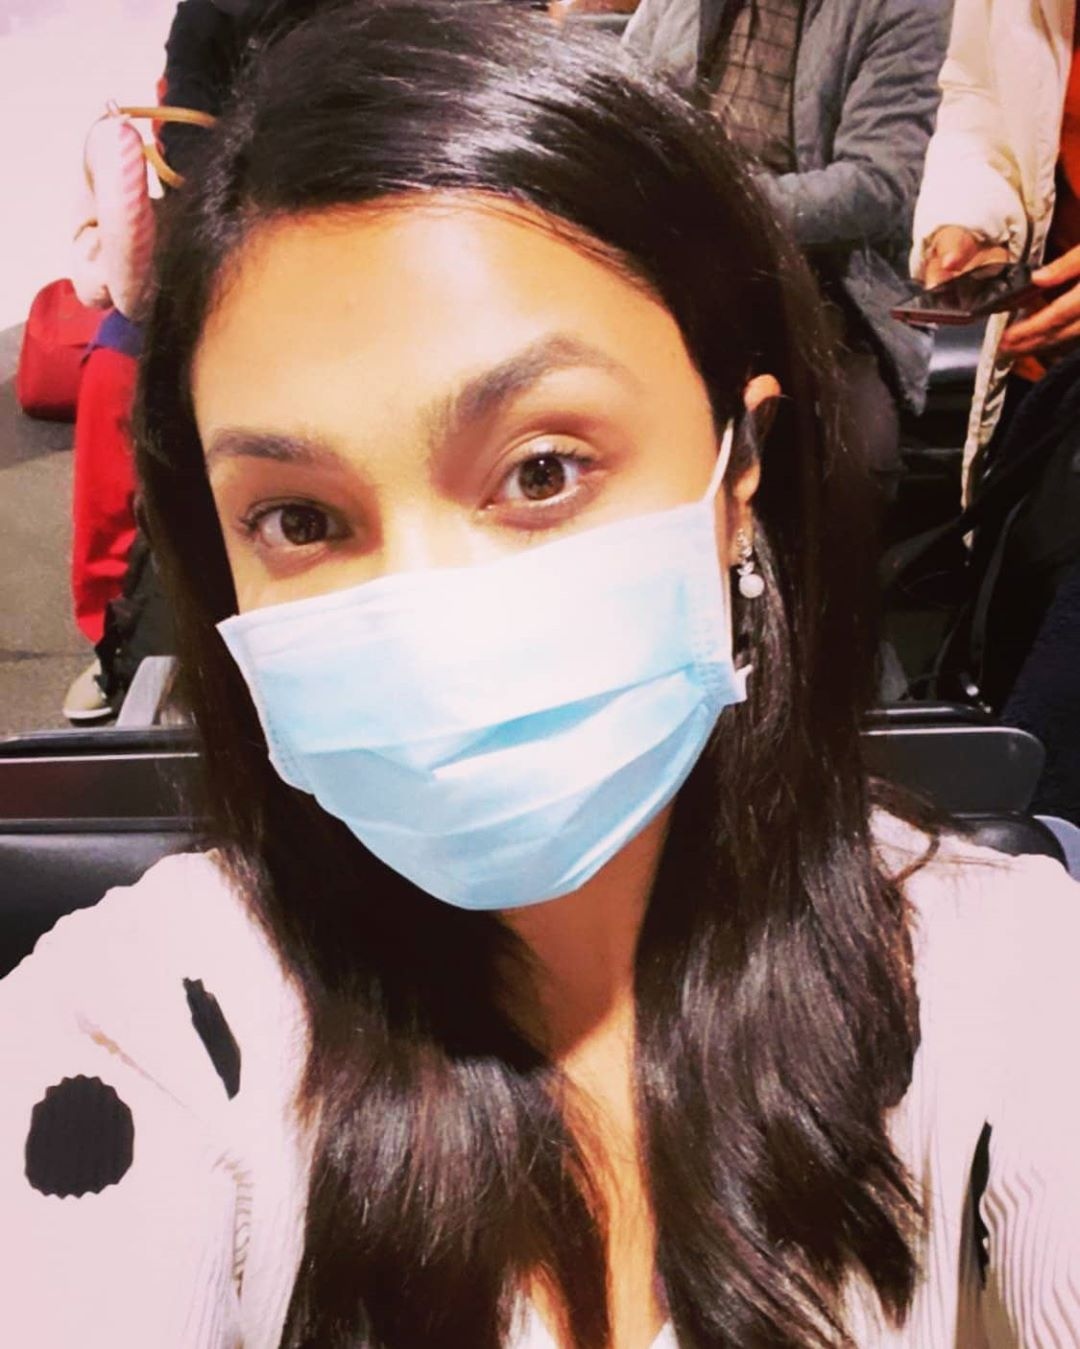 Anushka Shrestha self-quarantines after returning from abroad